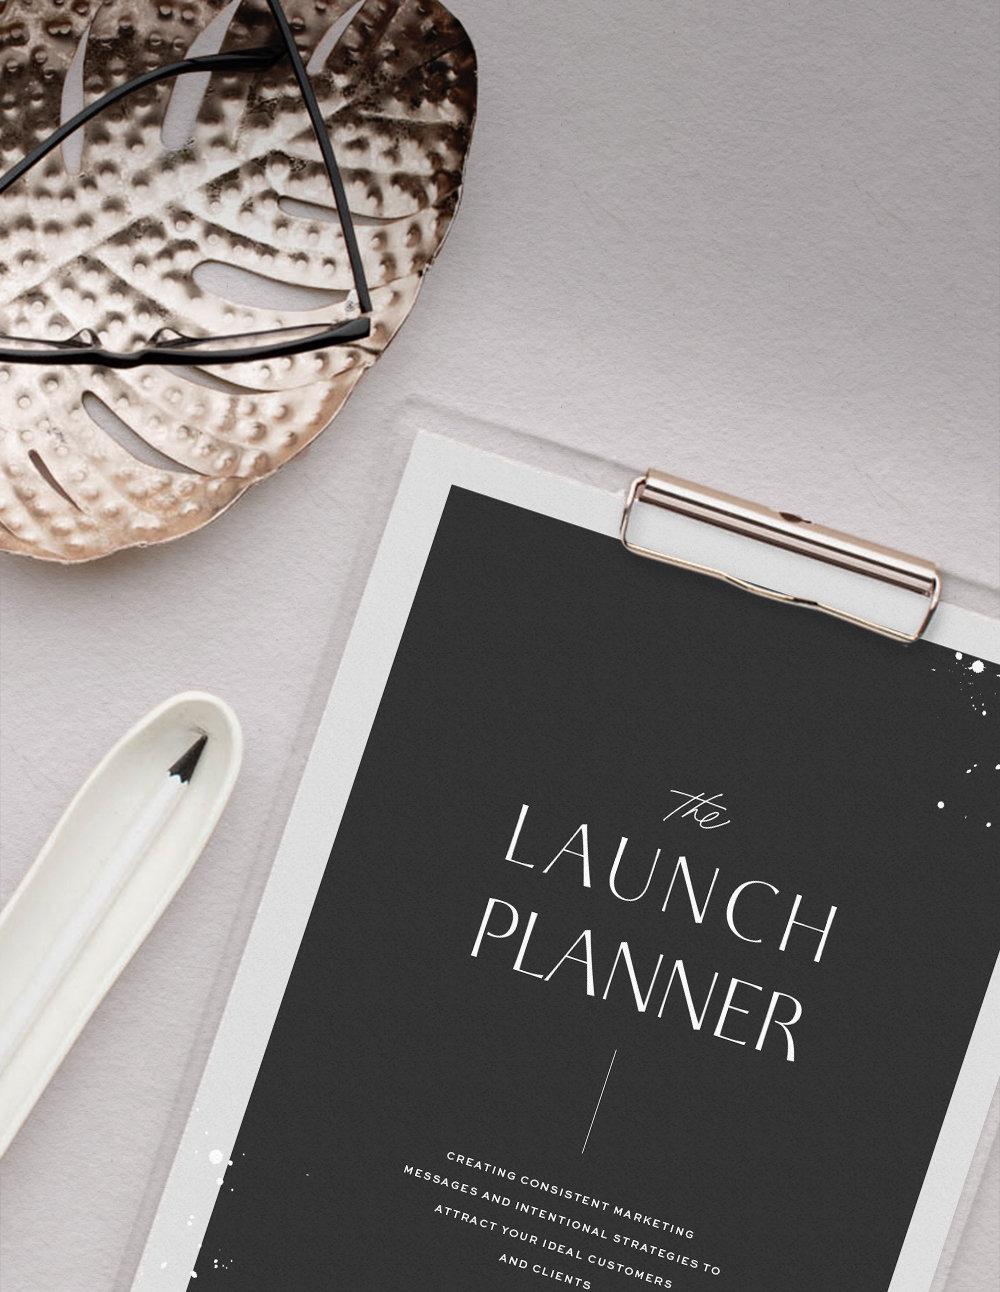 Creative & Strategic Launch Kit, Launch Planner, and Launch Guides. Easy-to-Edit Website Templates for Creative Businesses, Showit WebsiteTemplate Shop, Modern and Bold Social Media Templates, Saffron Avenue, www.saffronavenue.com